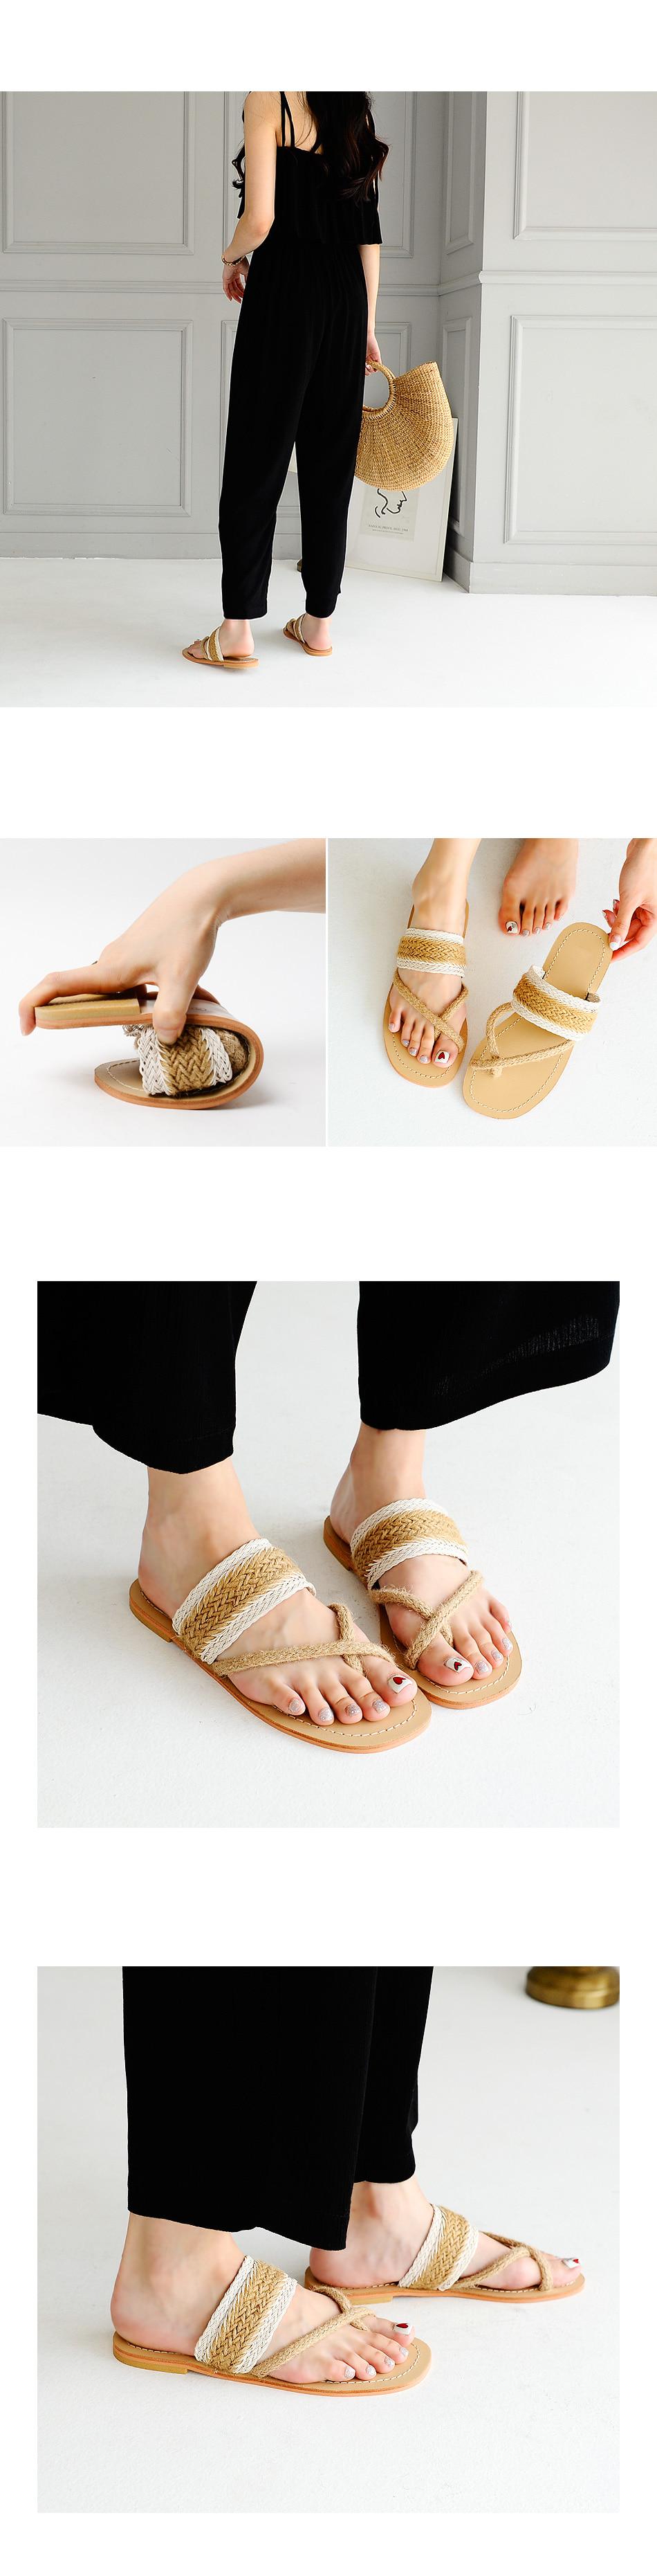 Lee Elbratan Slippers 1cm